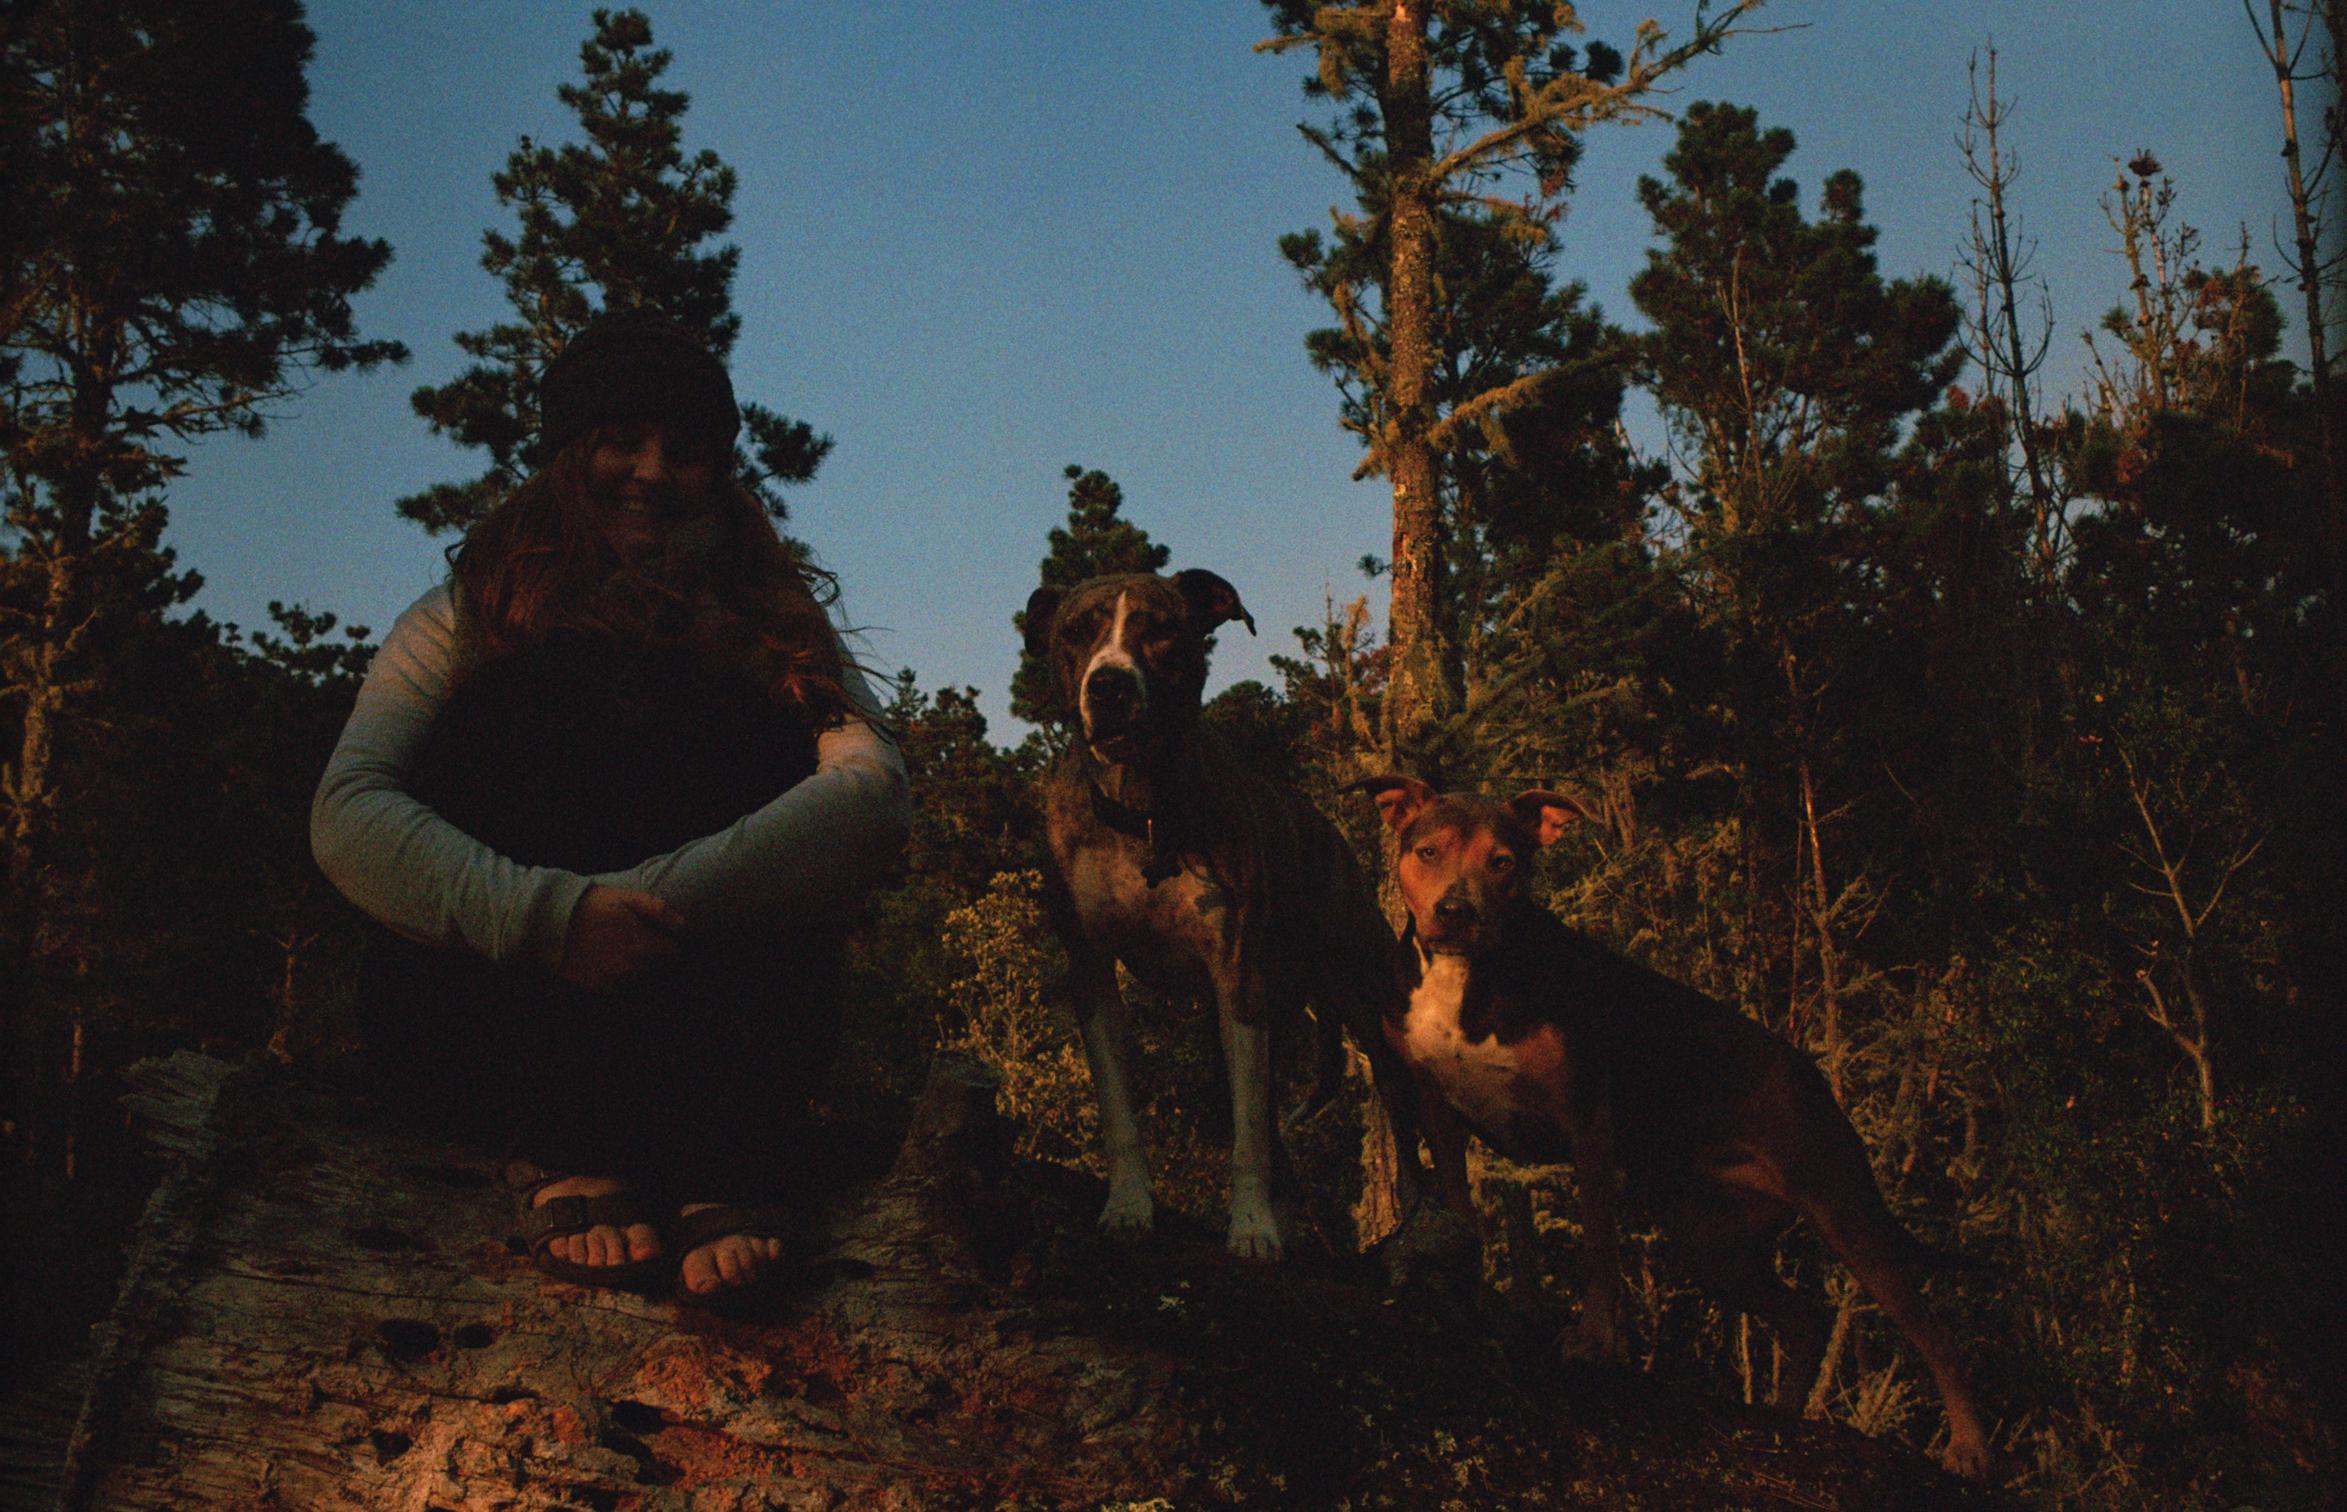 Tribe in Inverness, California